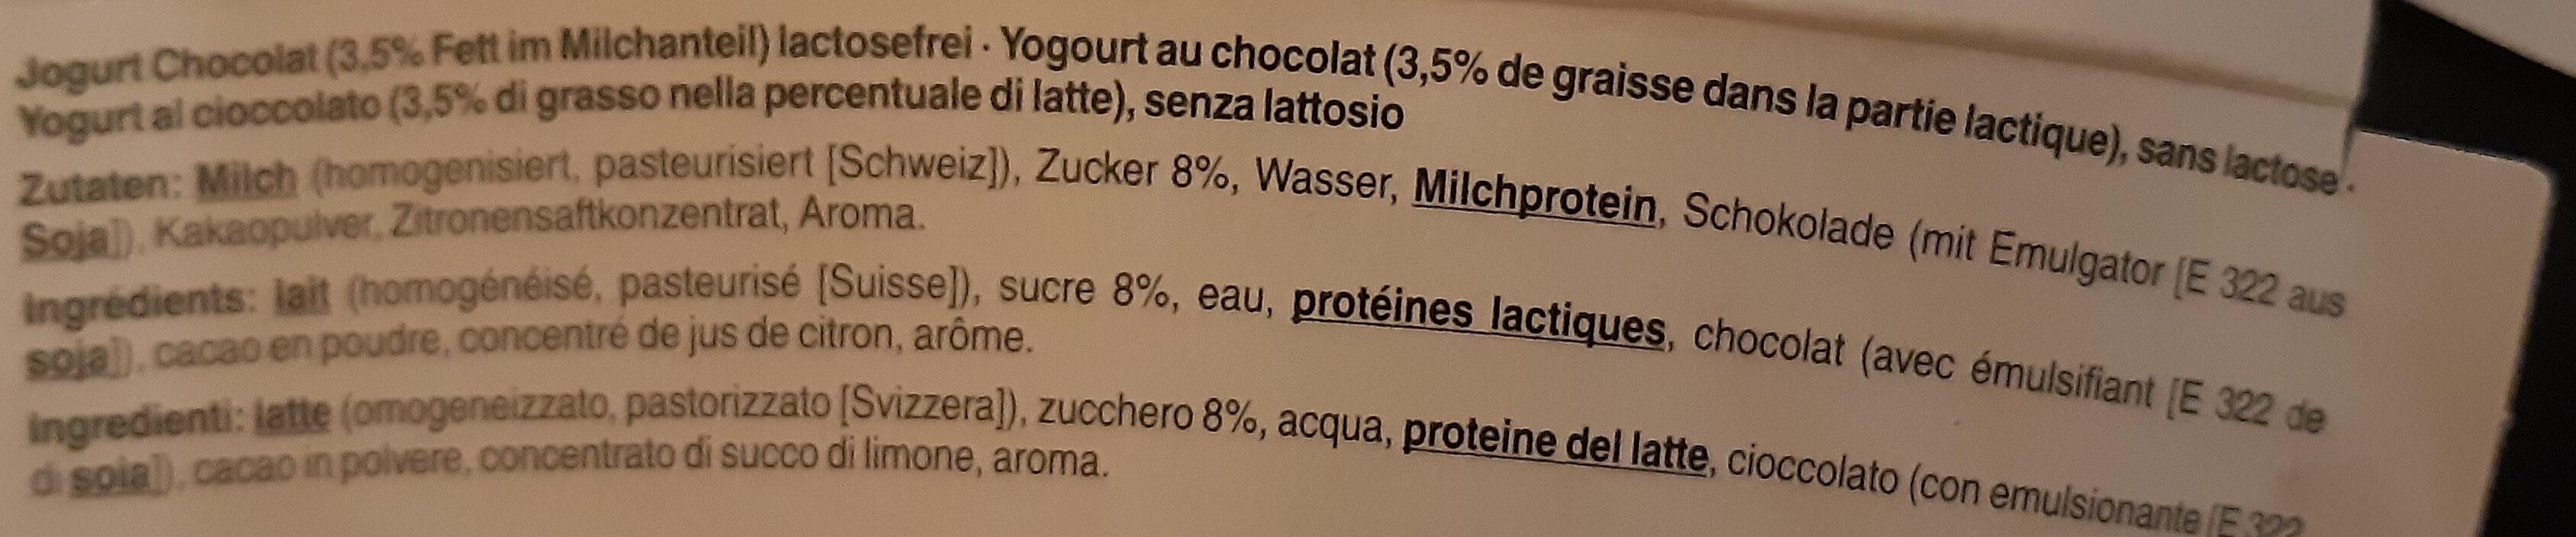 Jogurt chocolat - Ingredients - fr